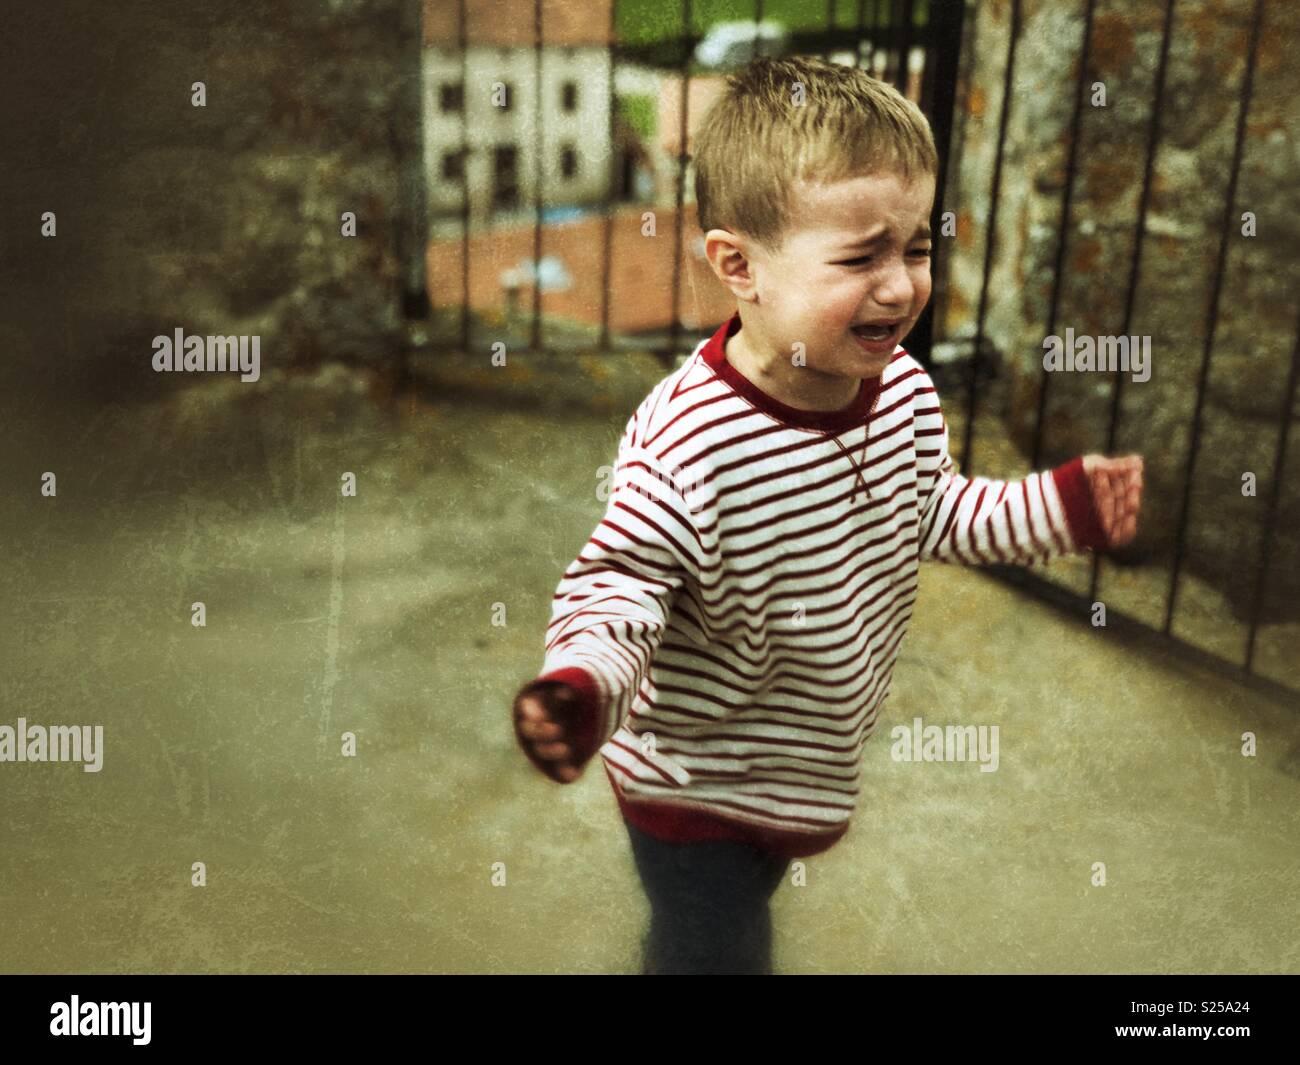 Tantrum boy - Stock Image